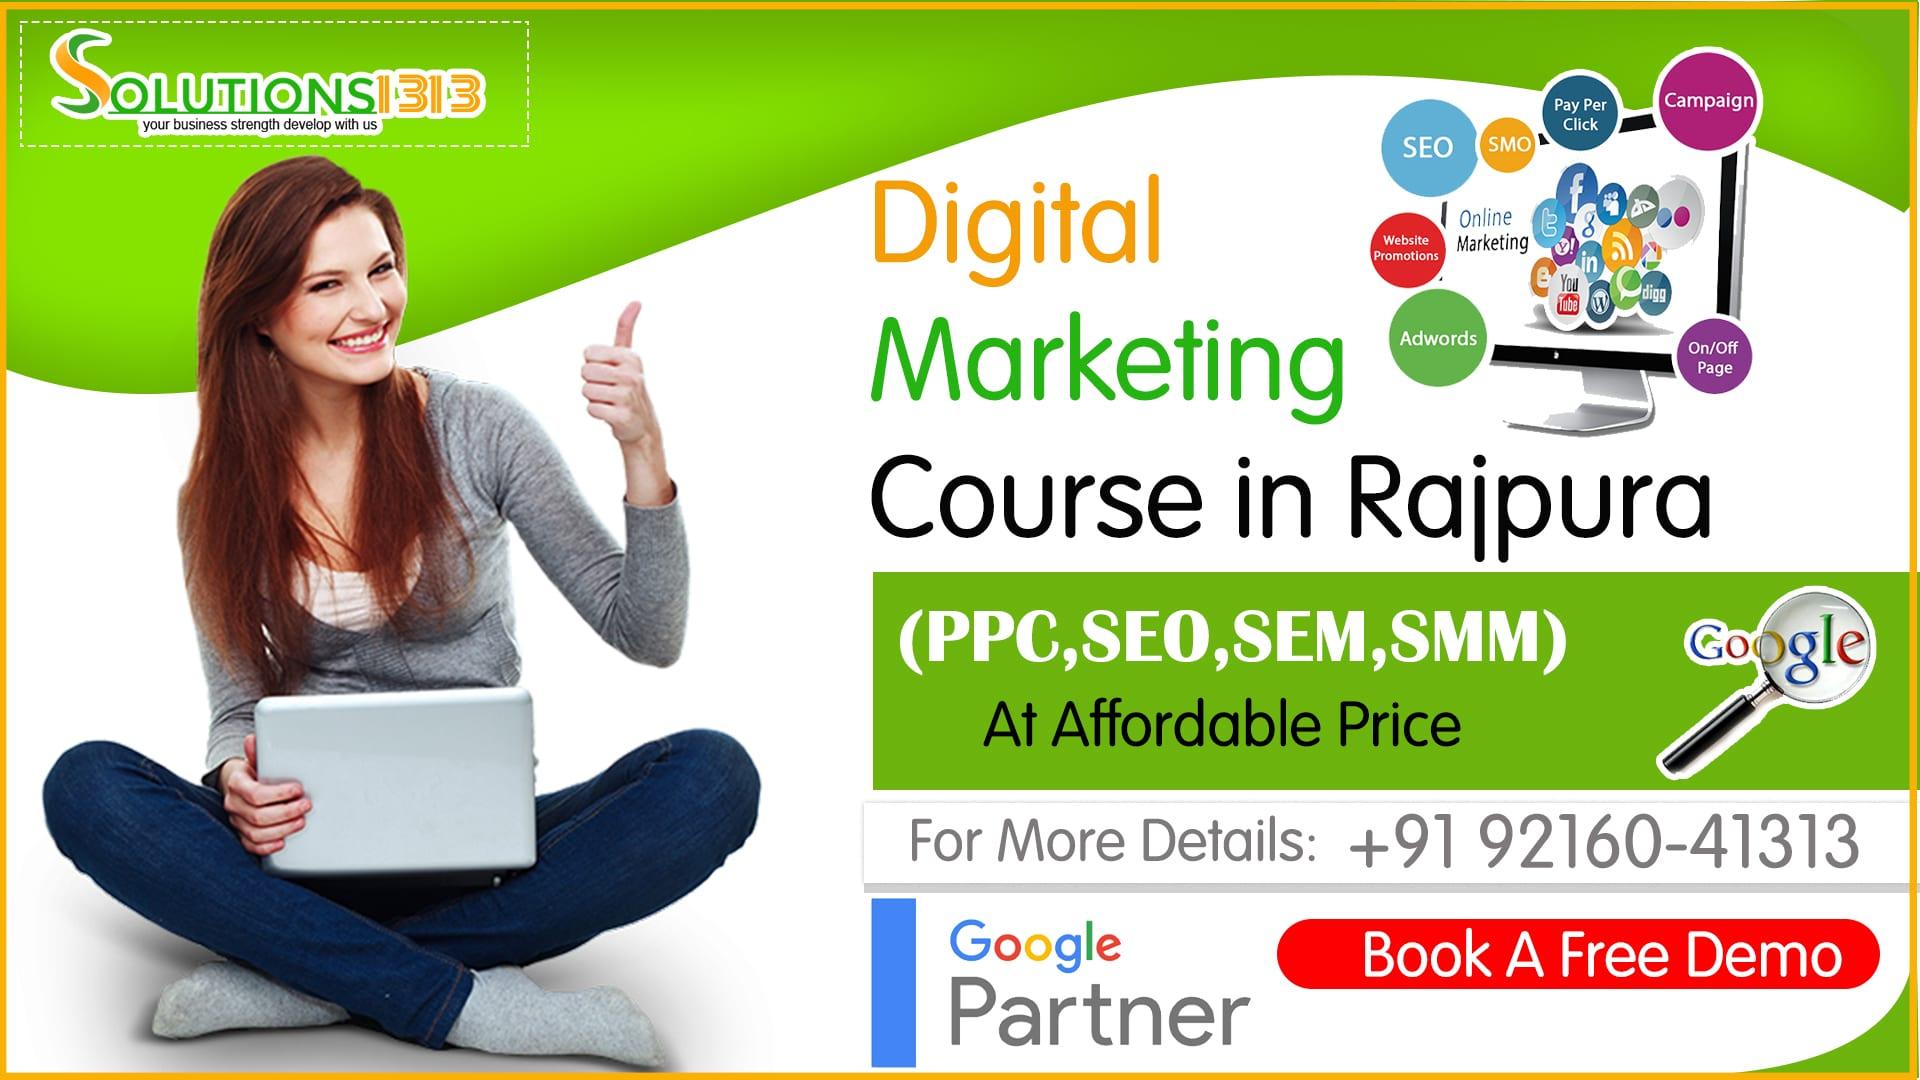 Digital Marketing Course in Rajpura